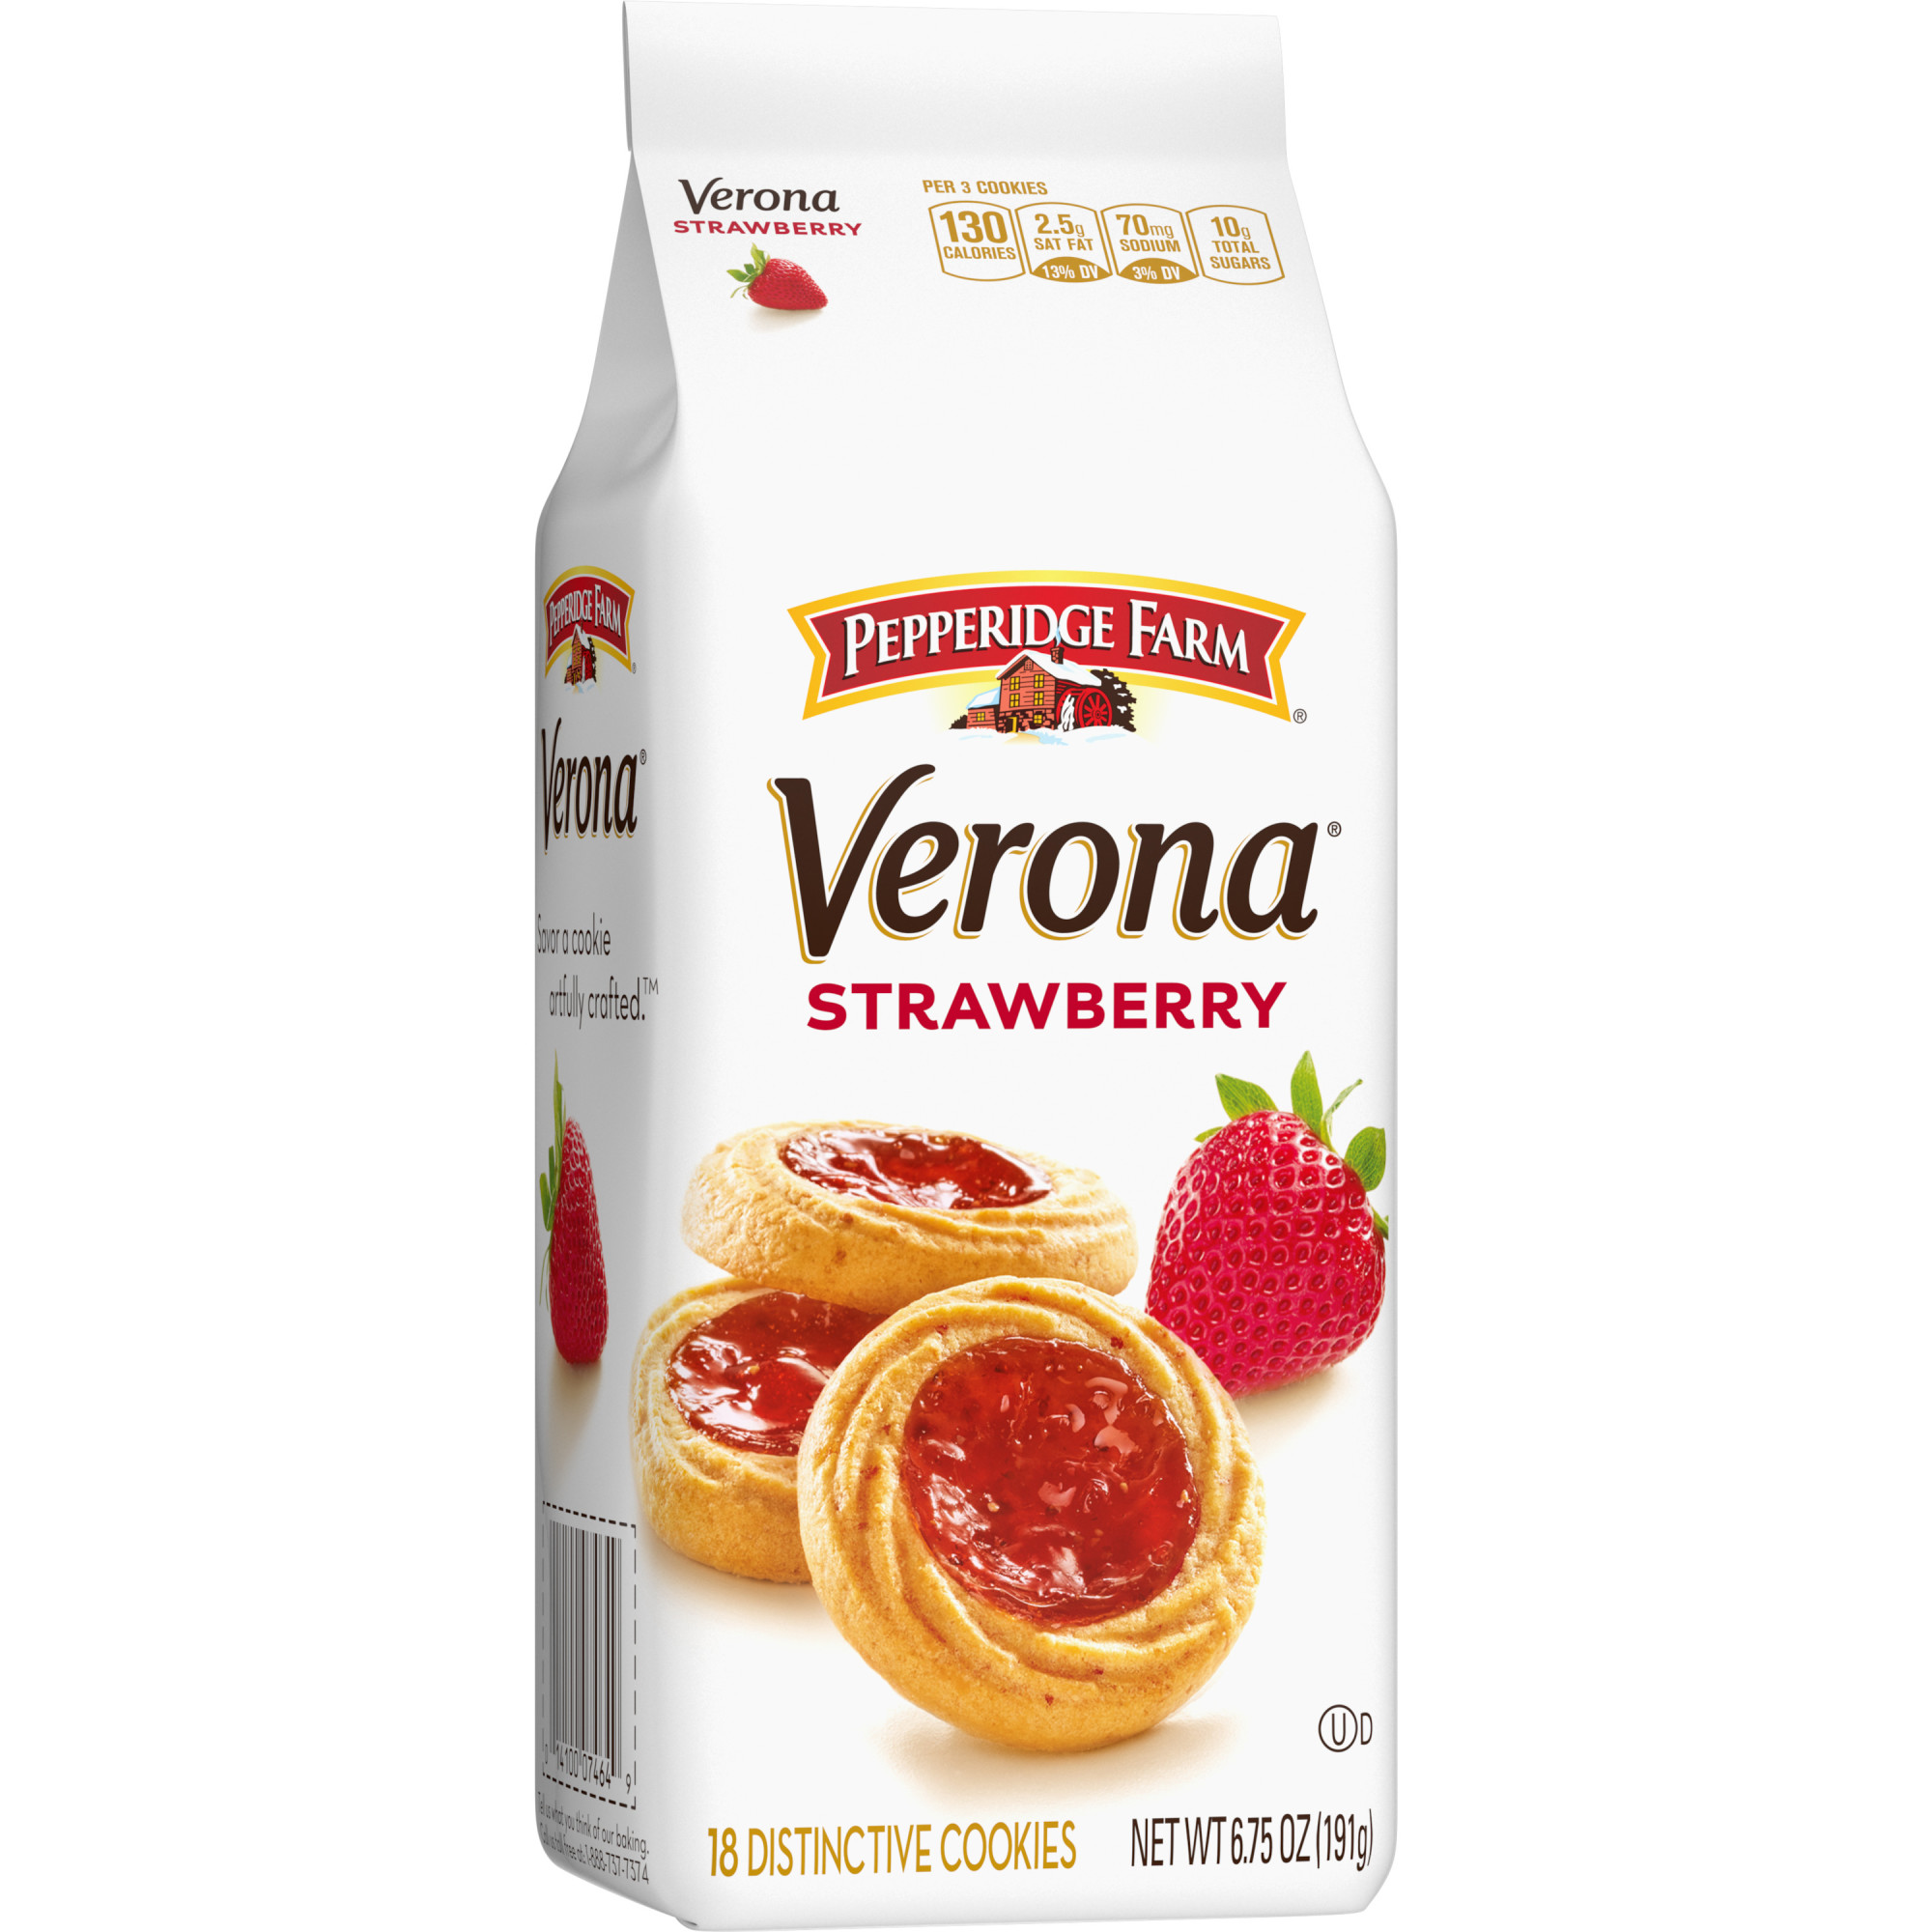 Pepperidge Farm Verona Strawberry Thumbprint Cookies 6 75 Oz Bag Walmart Com Walmart Com